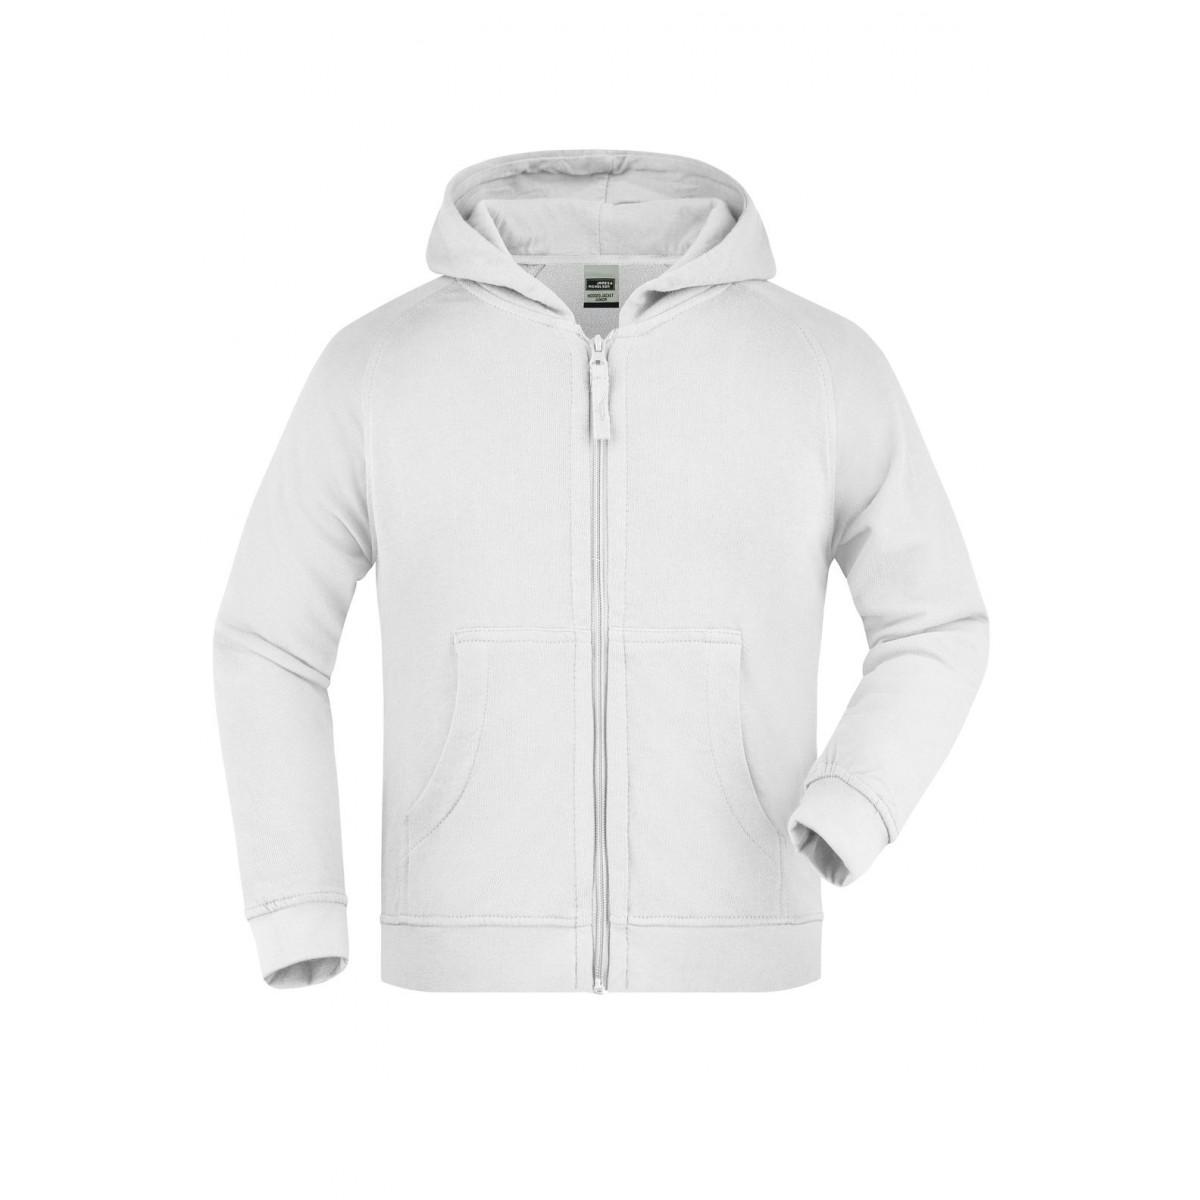 Толстовка детская JN059K Hooded Jacket Junior - Белый